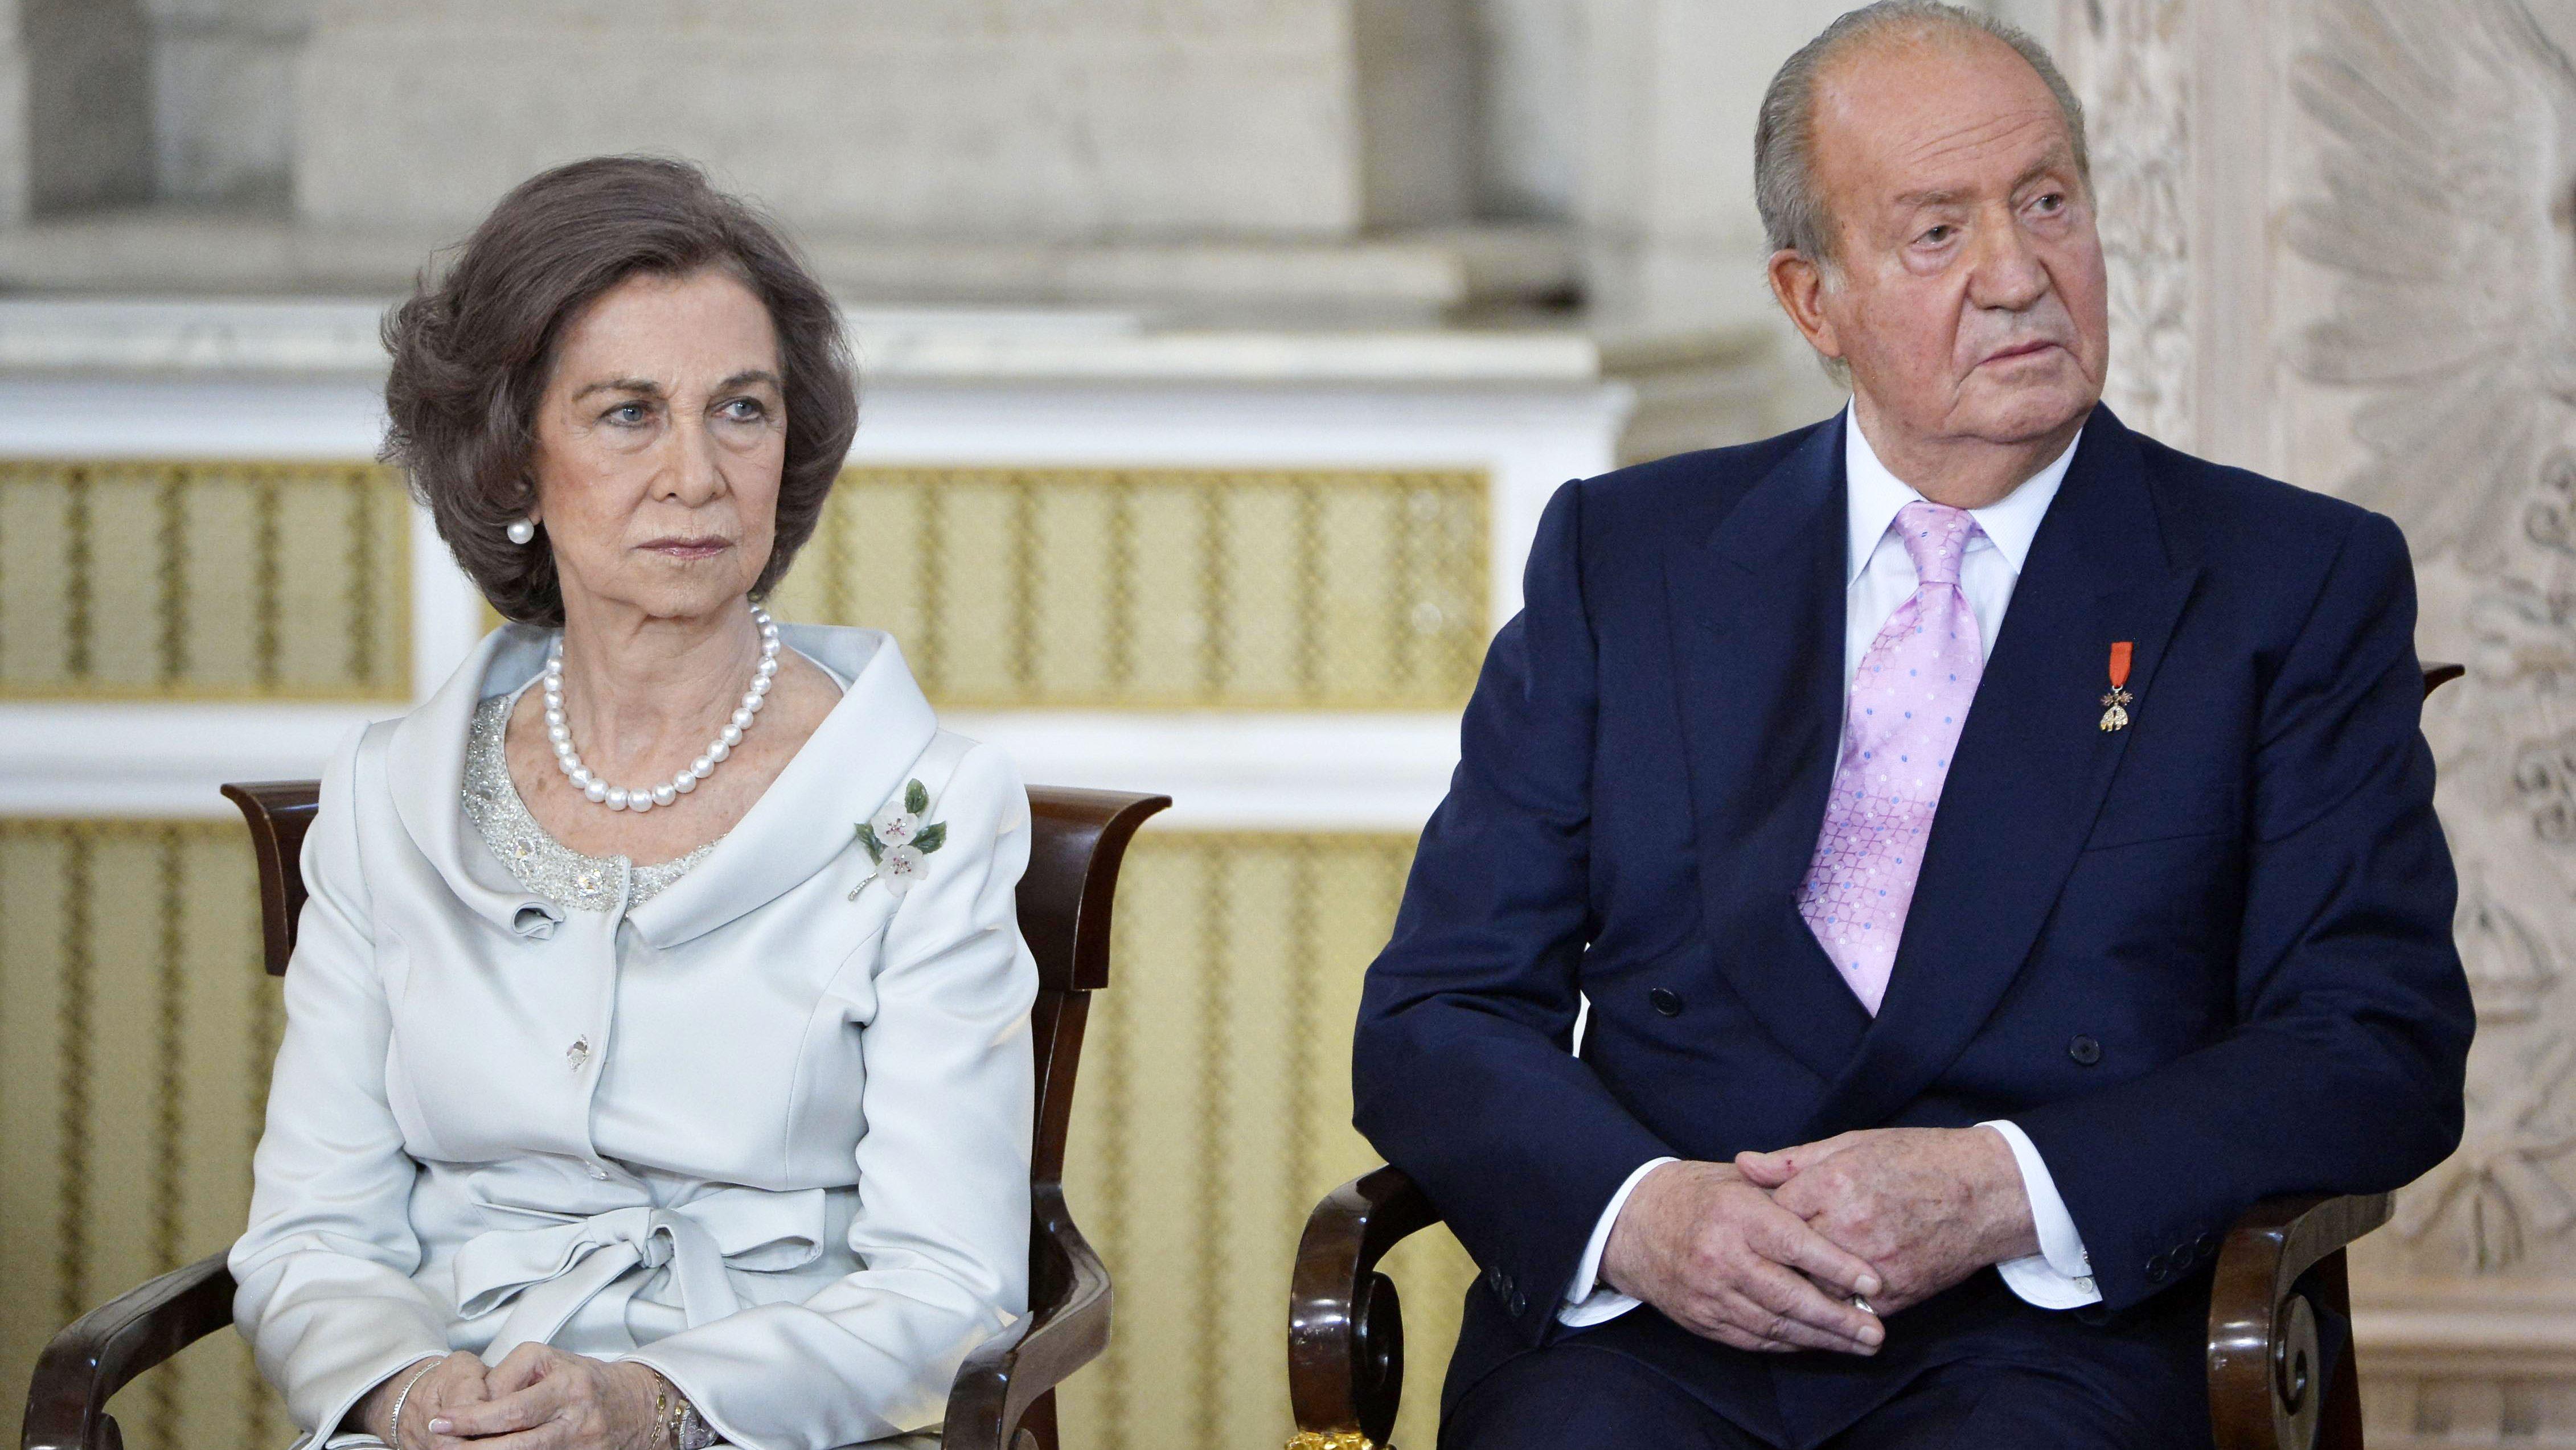 La reina Sofía junto a Juan Carlos I en una imagen de 2014. Europa Press.